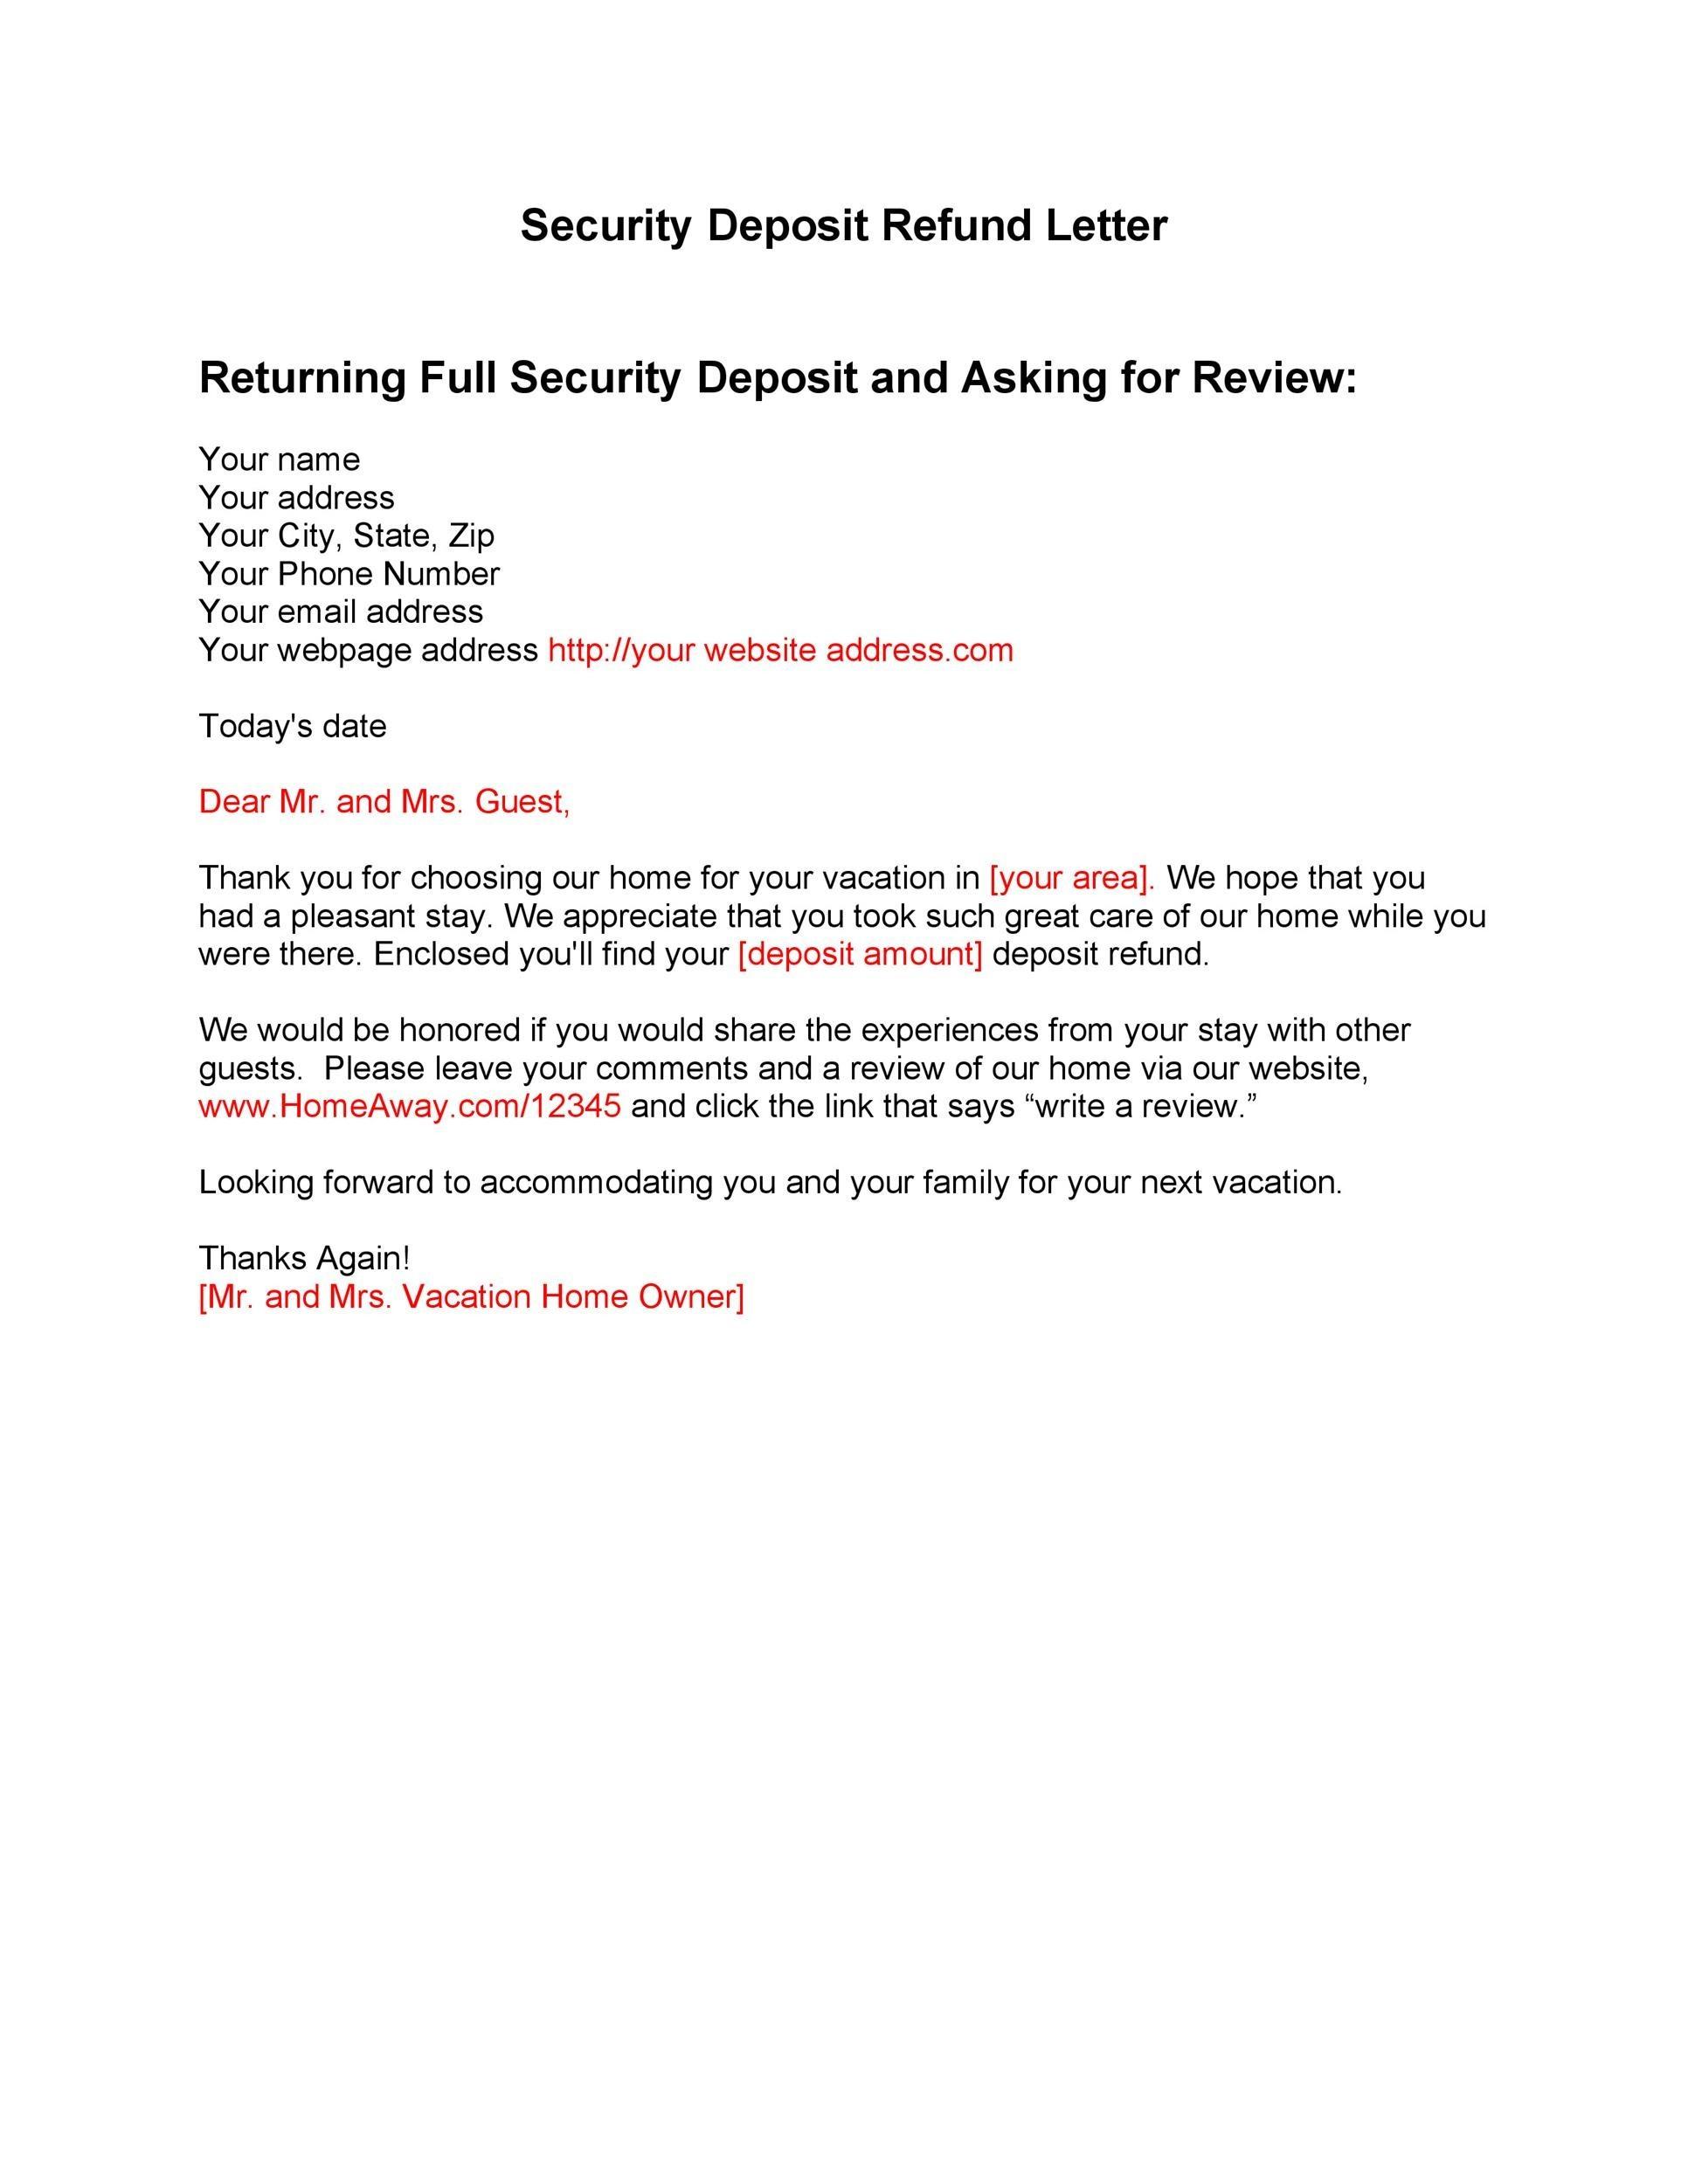 Sample Security Deposit Refund Letter from templatelab.com